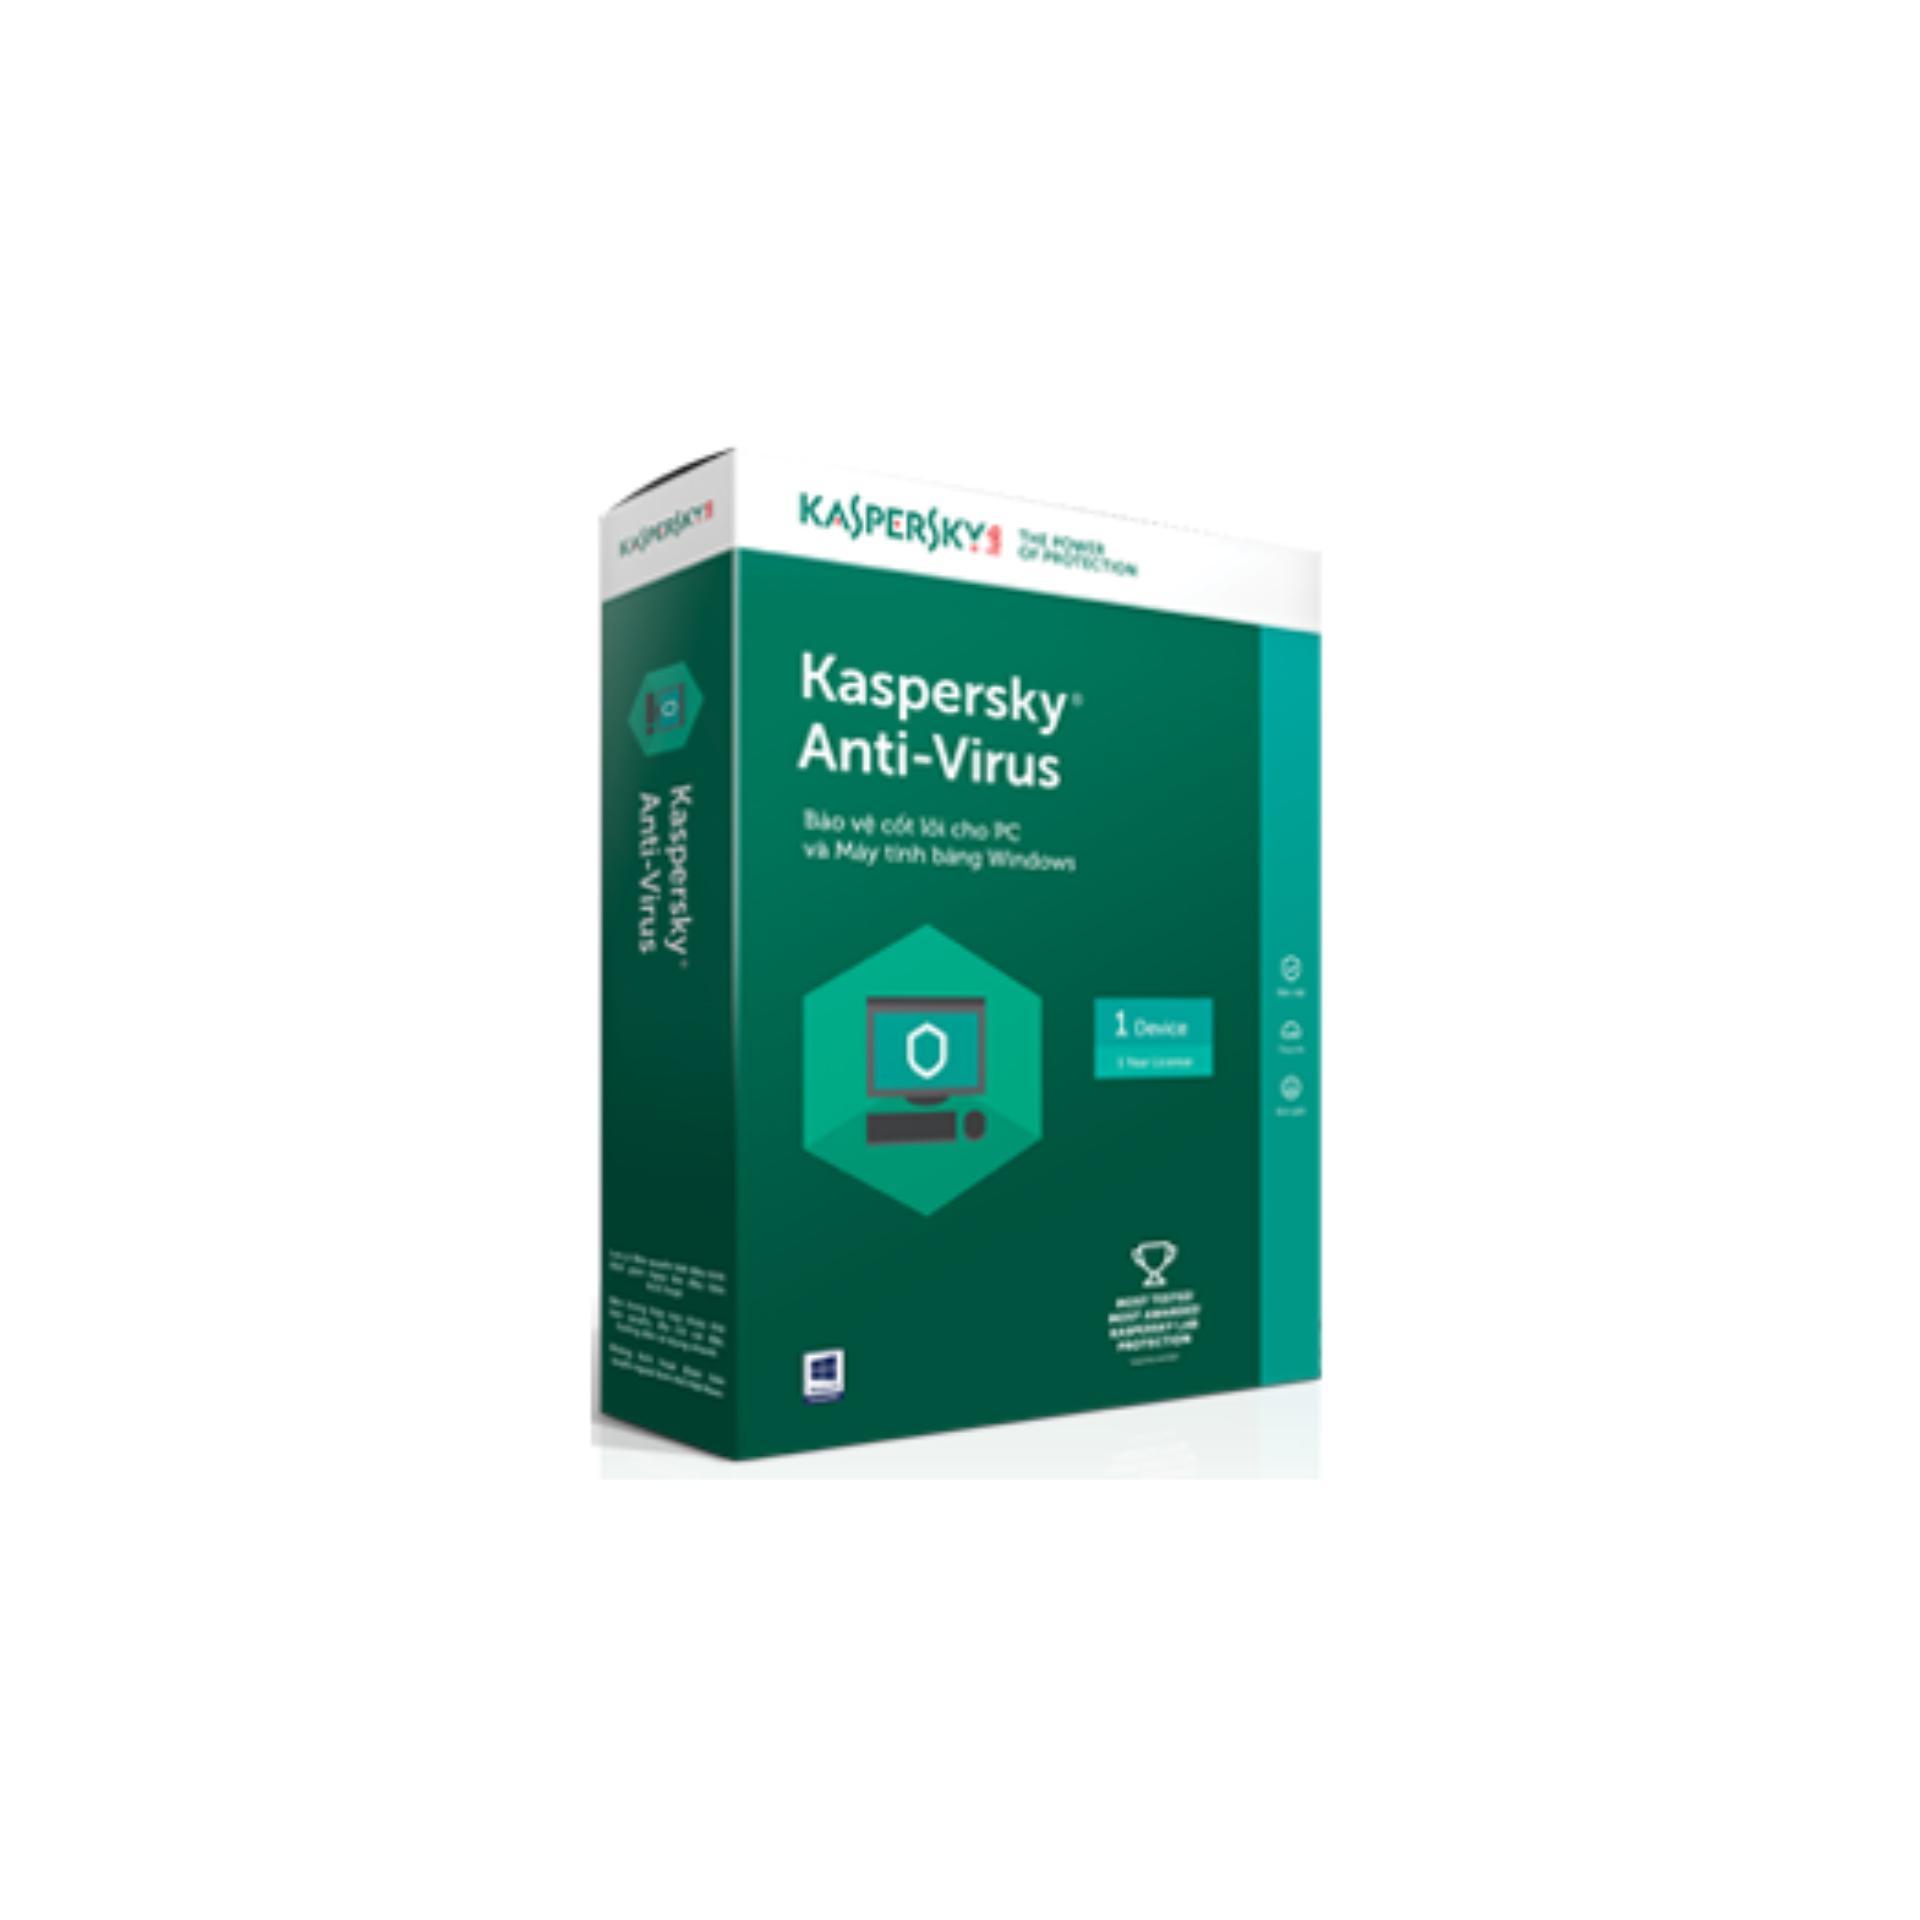 Phần Mềm Diệt Virus Kaspersky Anti Virus 1Pc Kaspersky Chiết Khấu 50